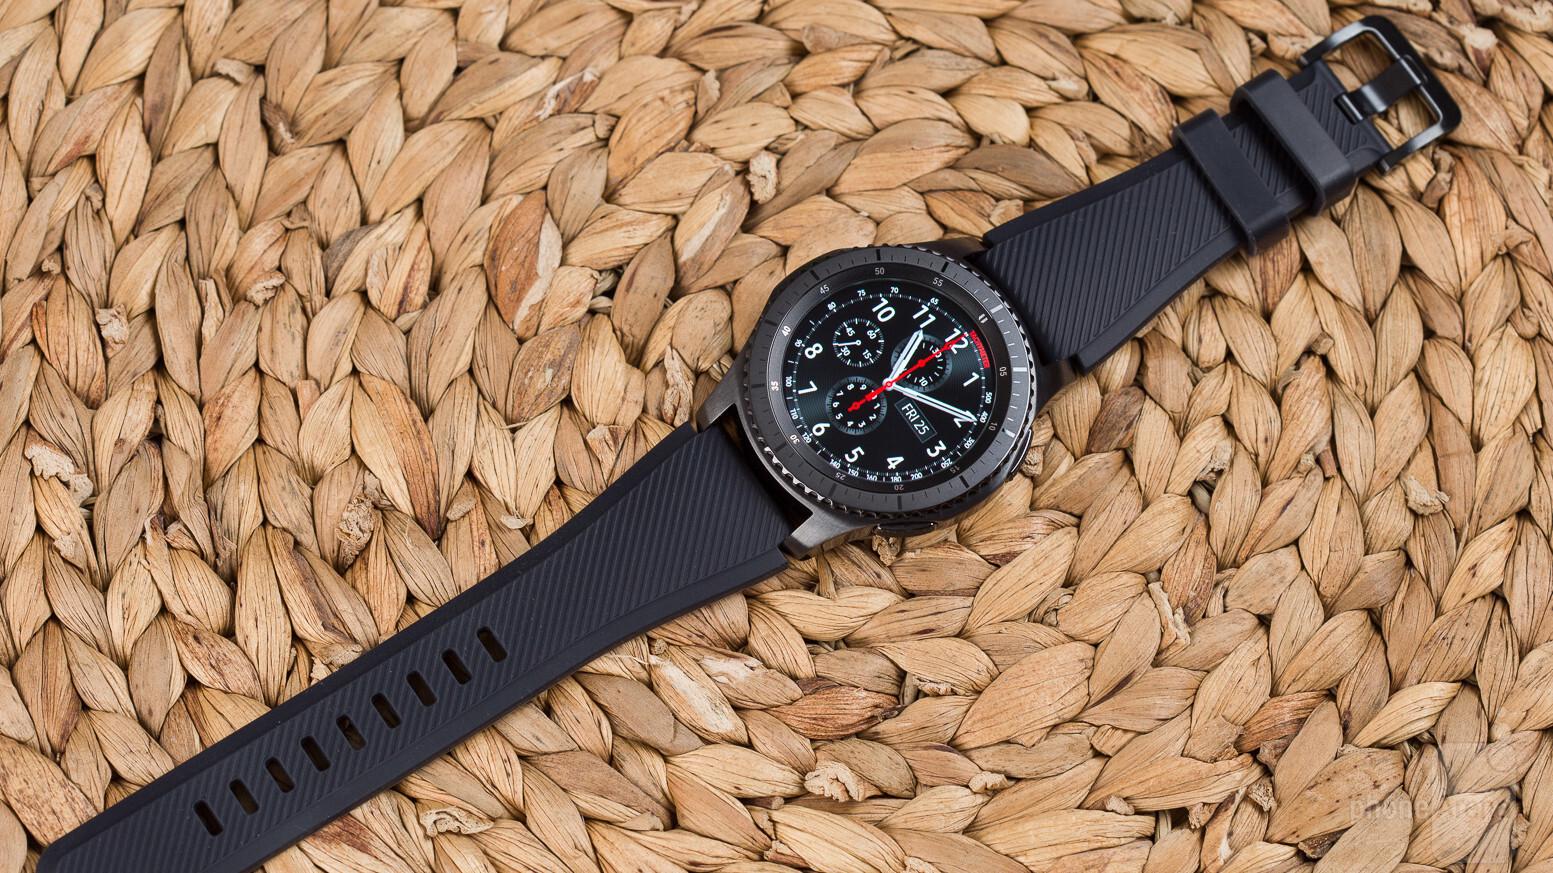 Samsung Gear S3 frontier smartwatch review - PhoneArena